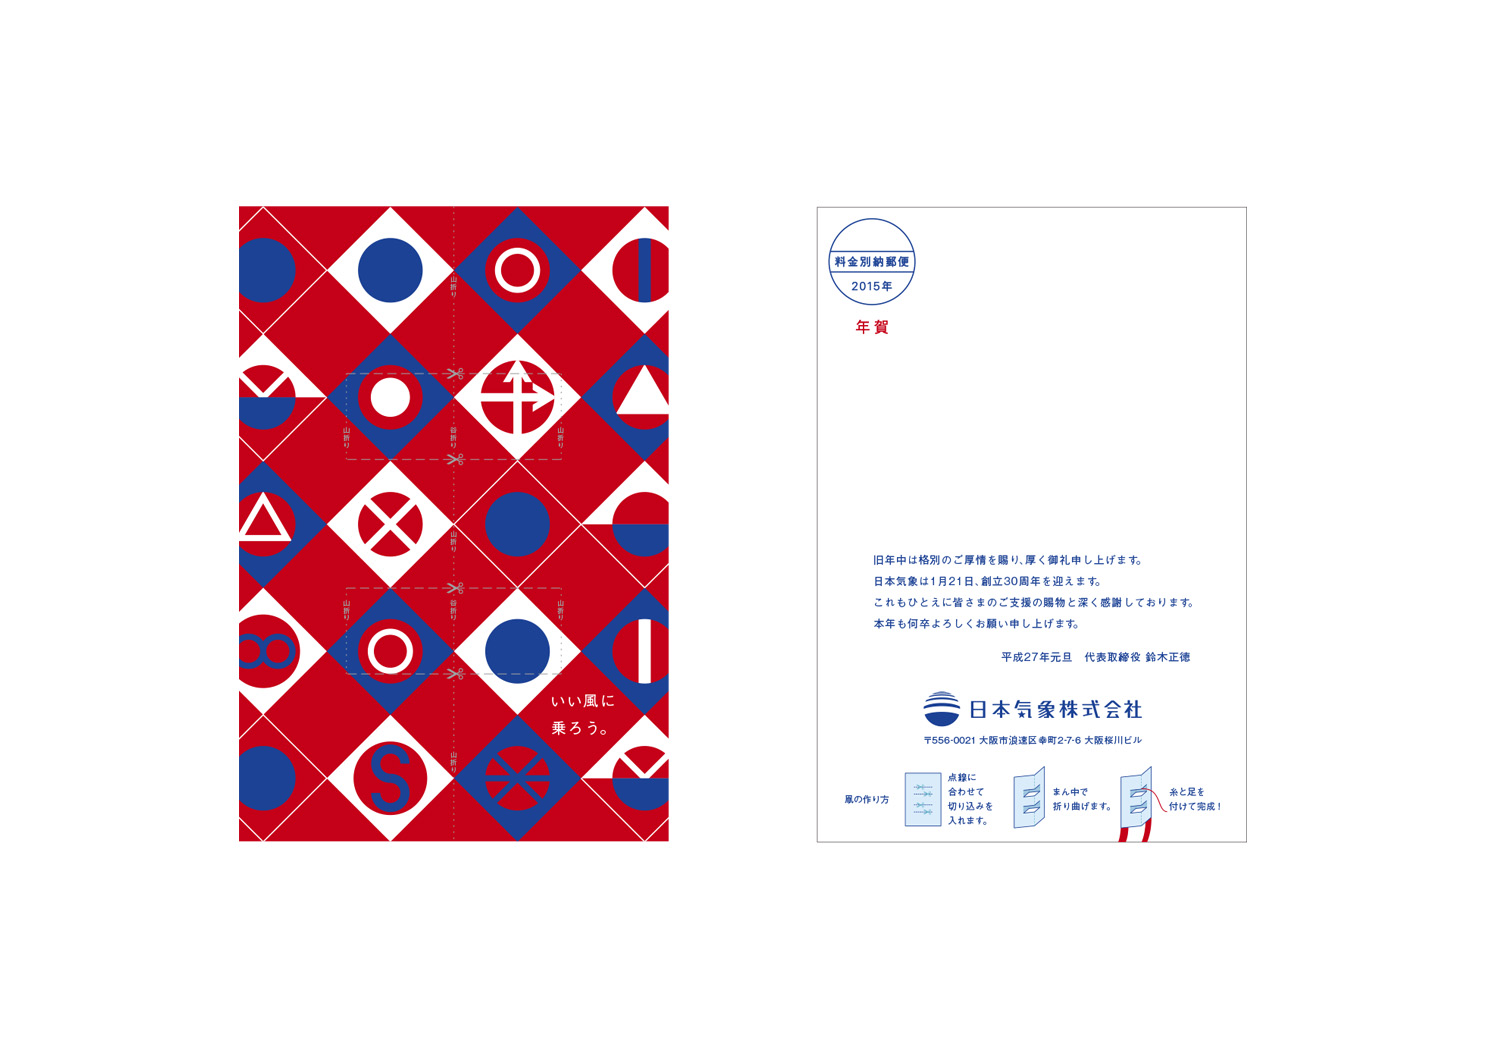 Nihonkisho 2015 New Year's Card